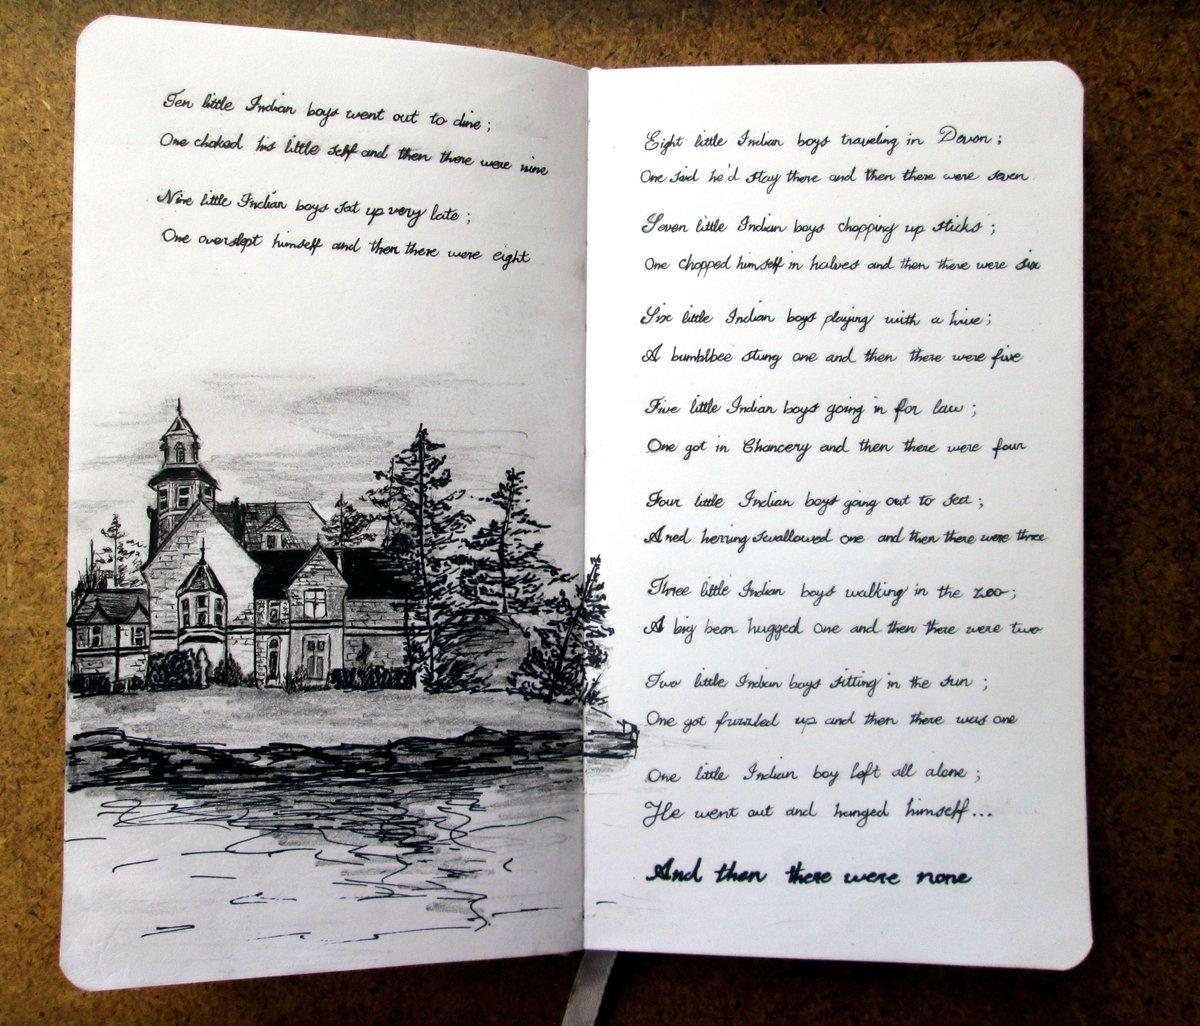 Sadaf Dalir Twitterda Indian Island Sketch And The Ten